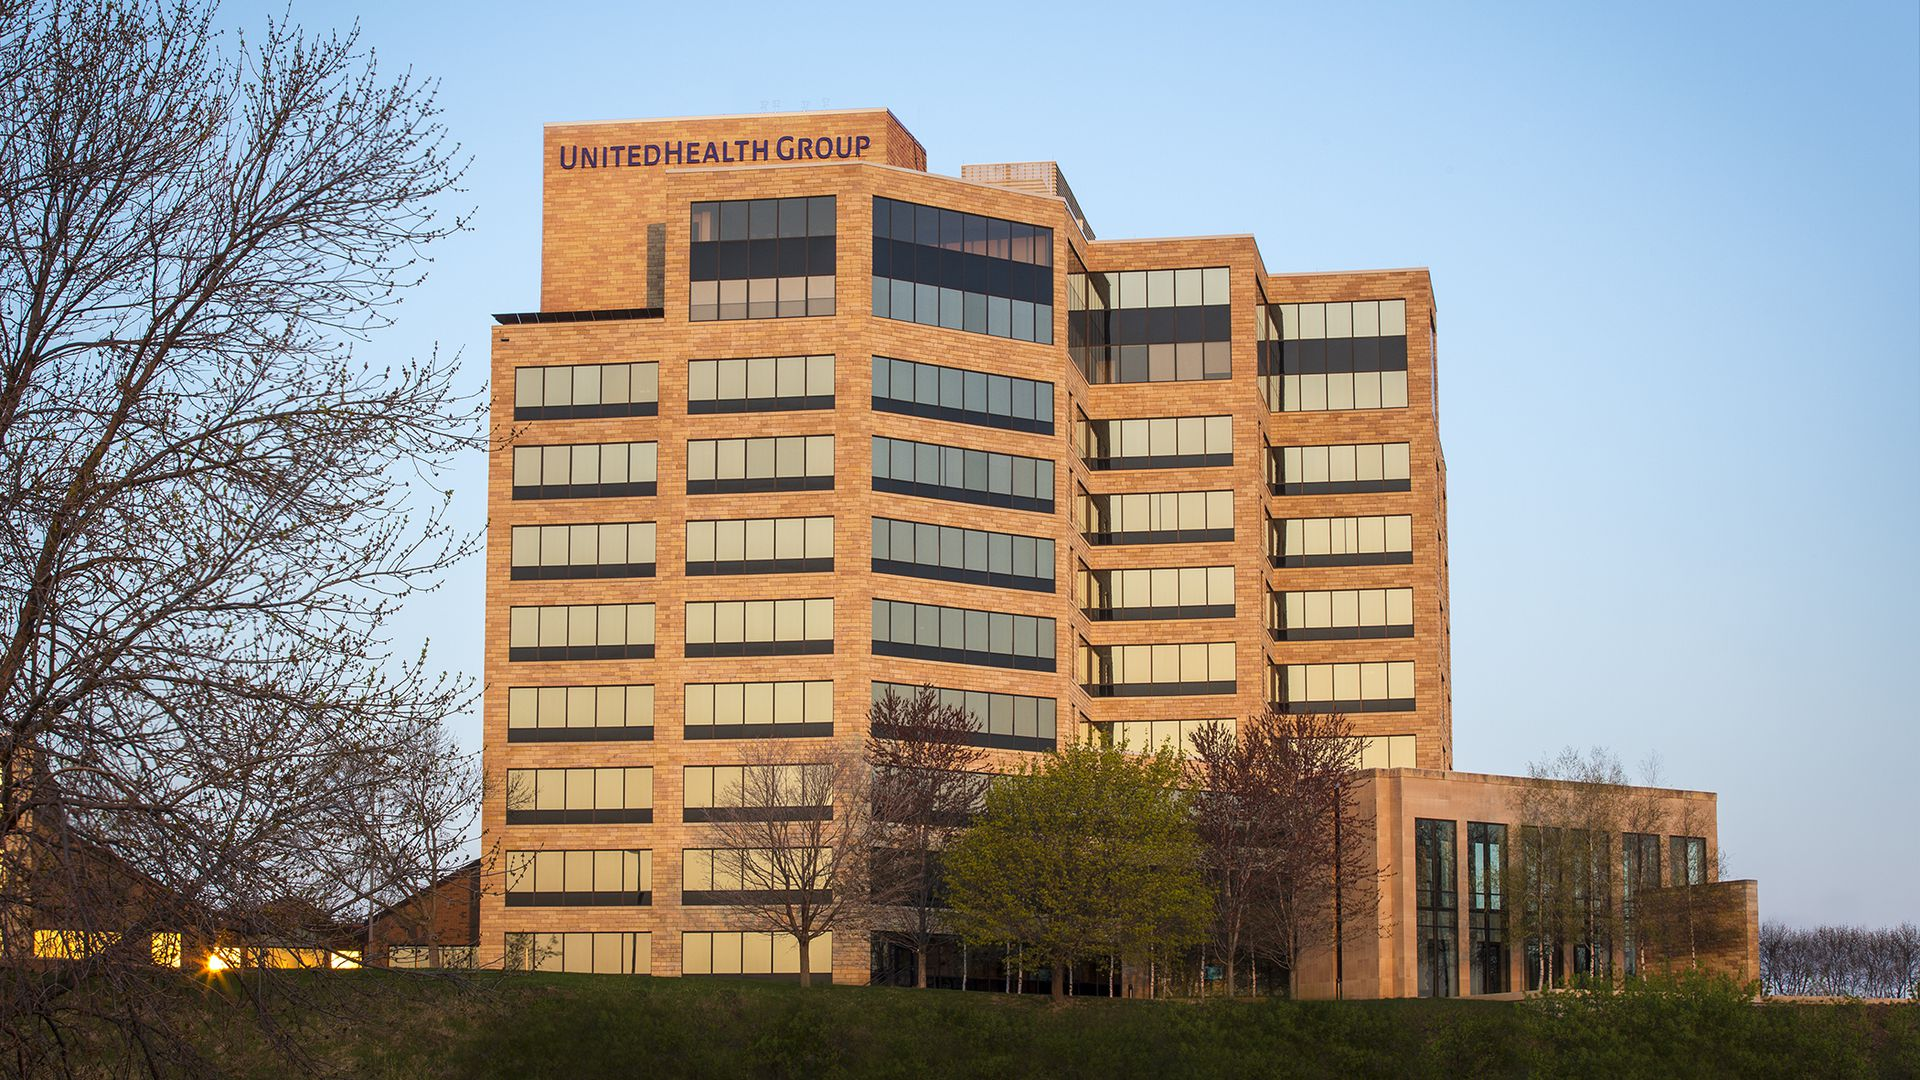 UnitedHealth Group headquarters building.